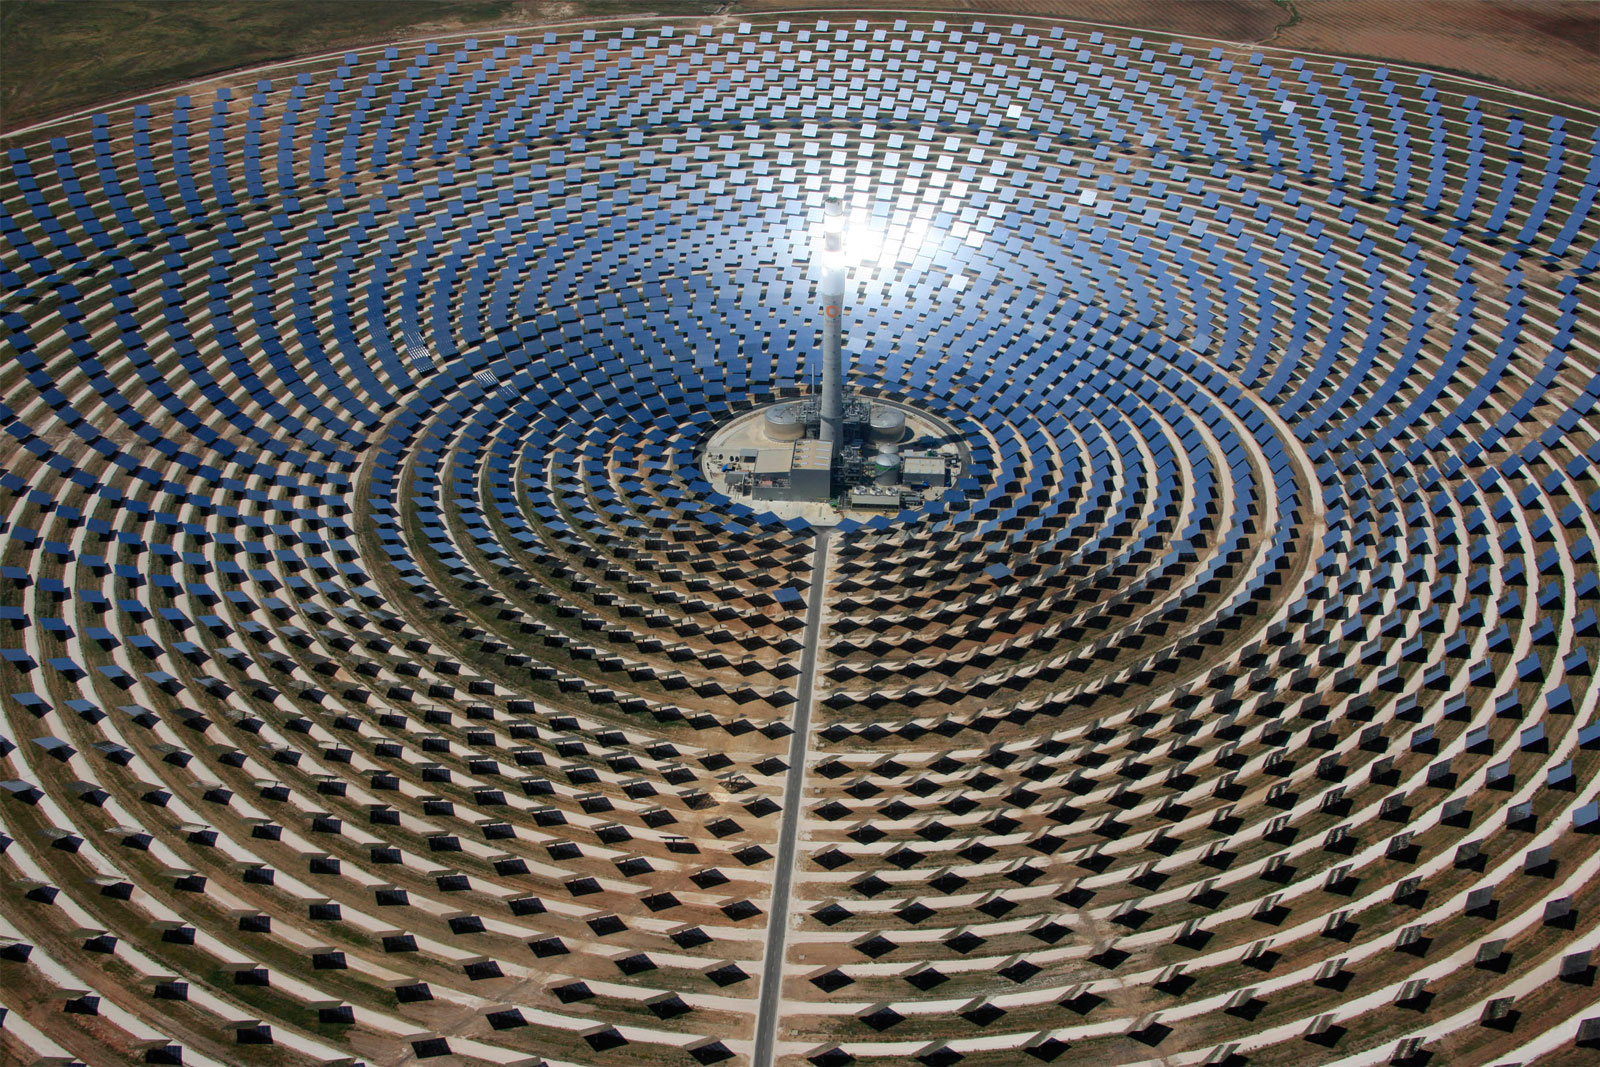 naperőmű, napenergia, napsugárzás, napkollektor, napelem